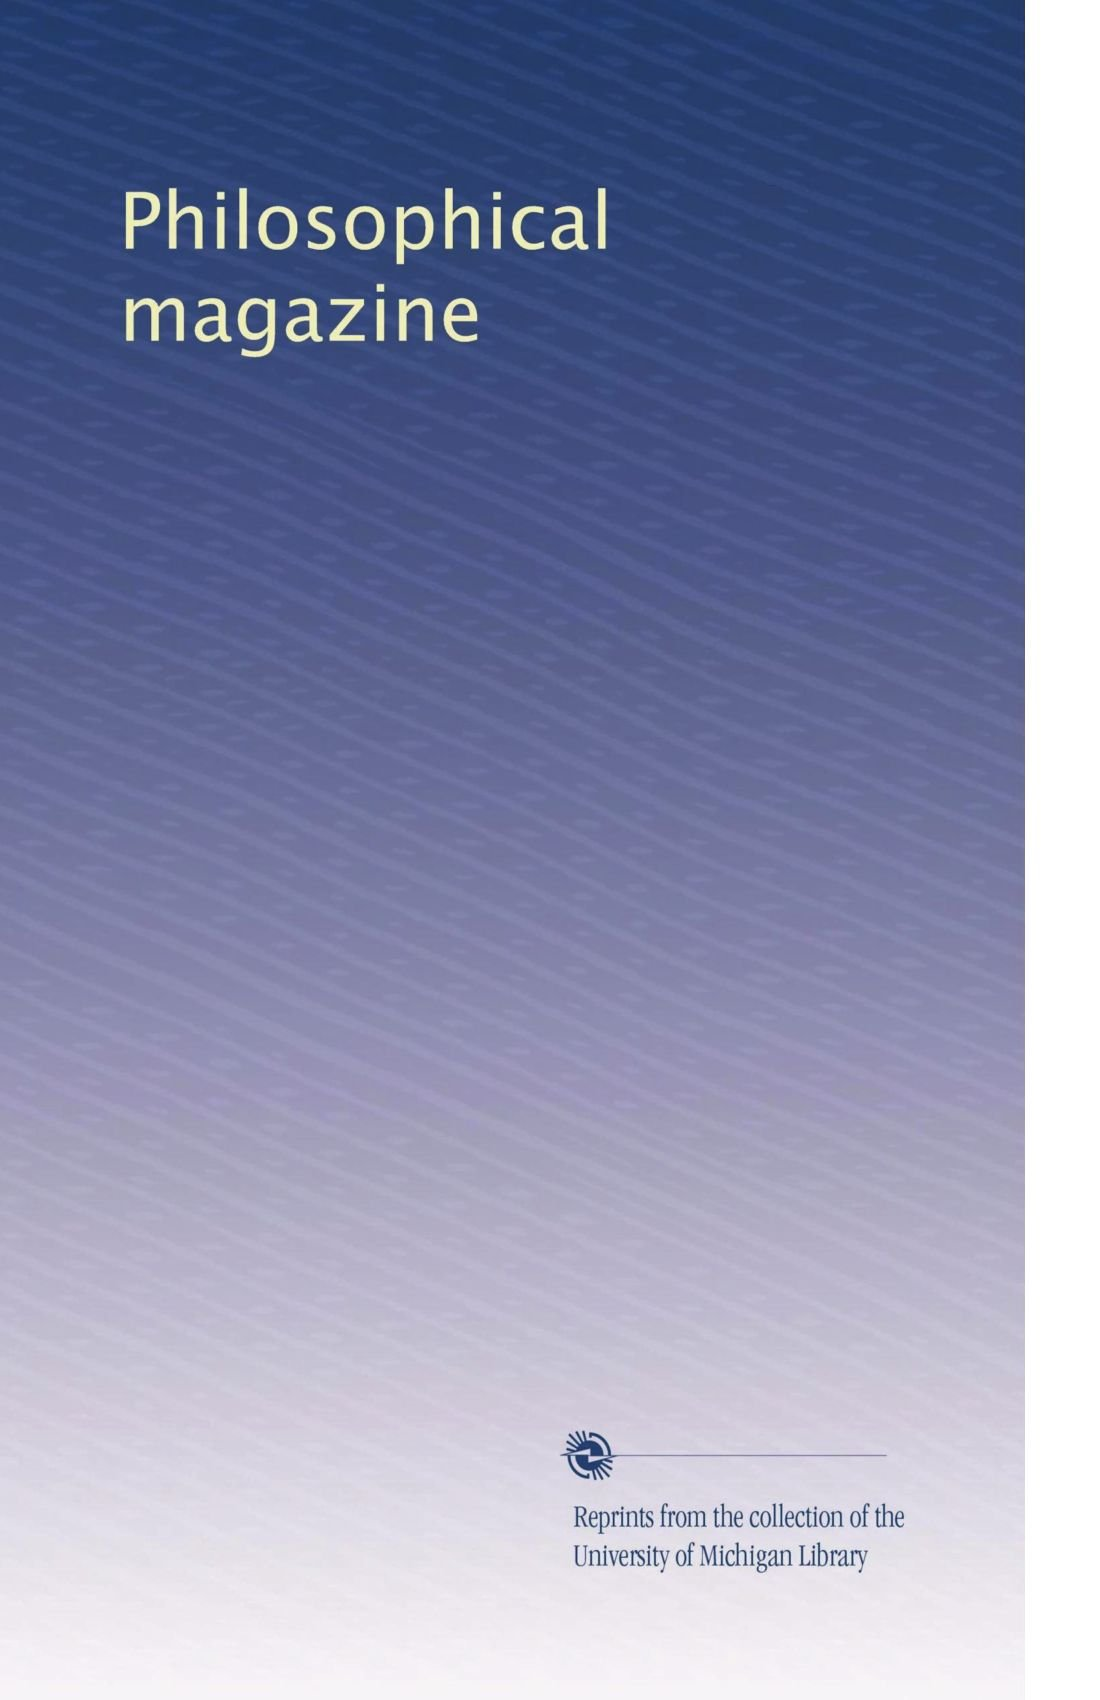 Philosophical magazine (Volume 8) ebook